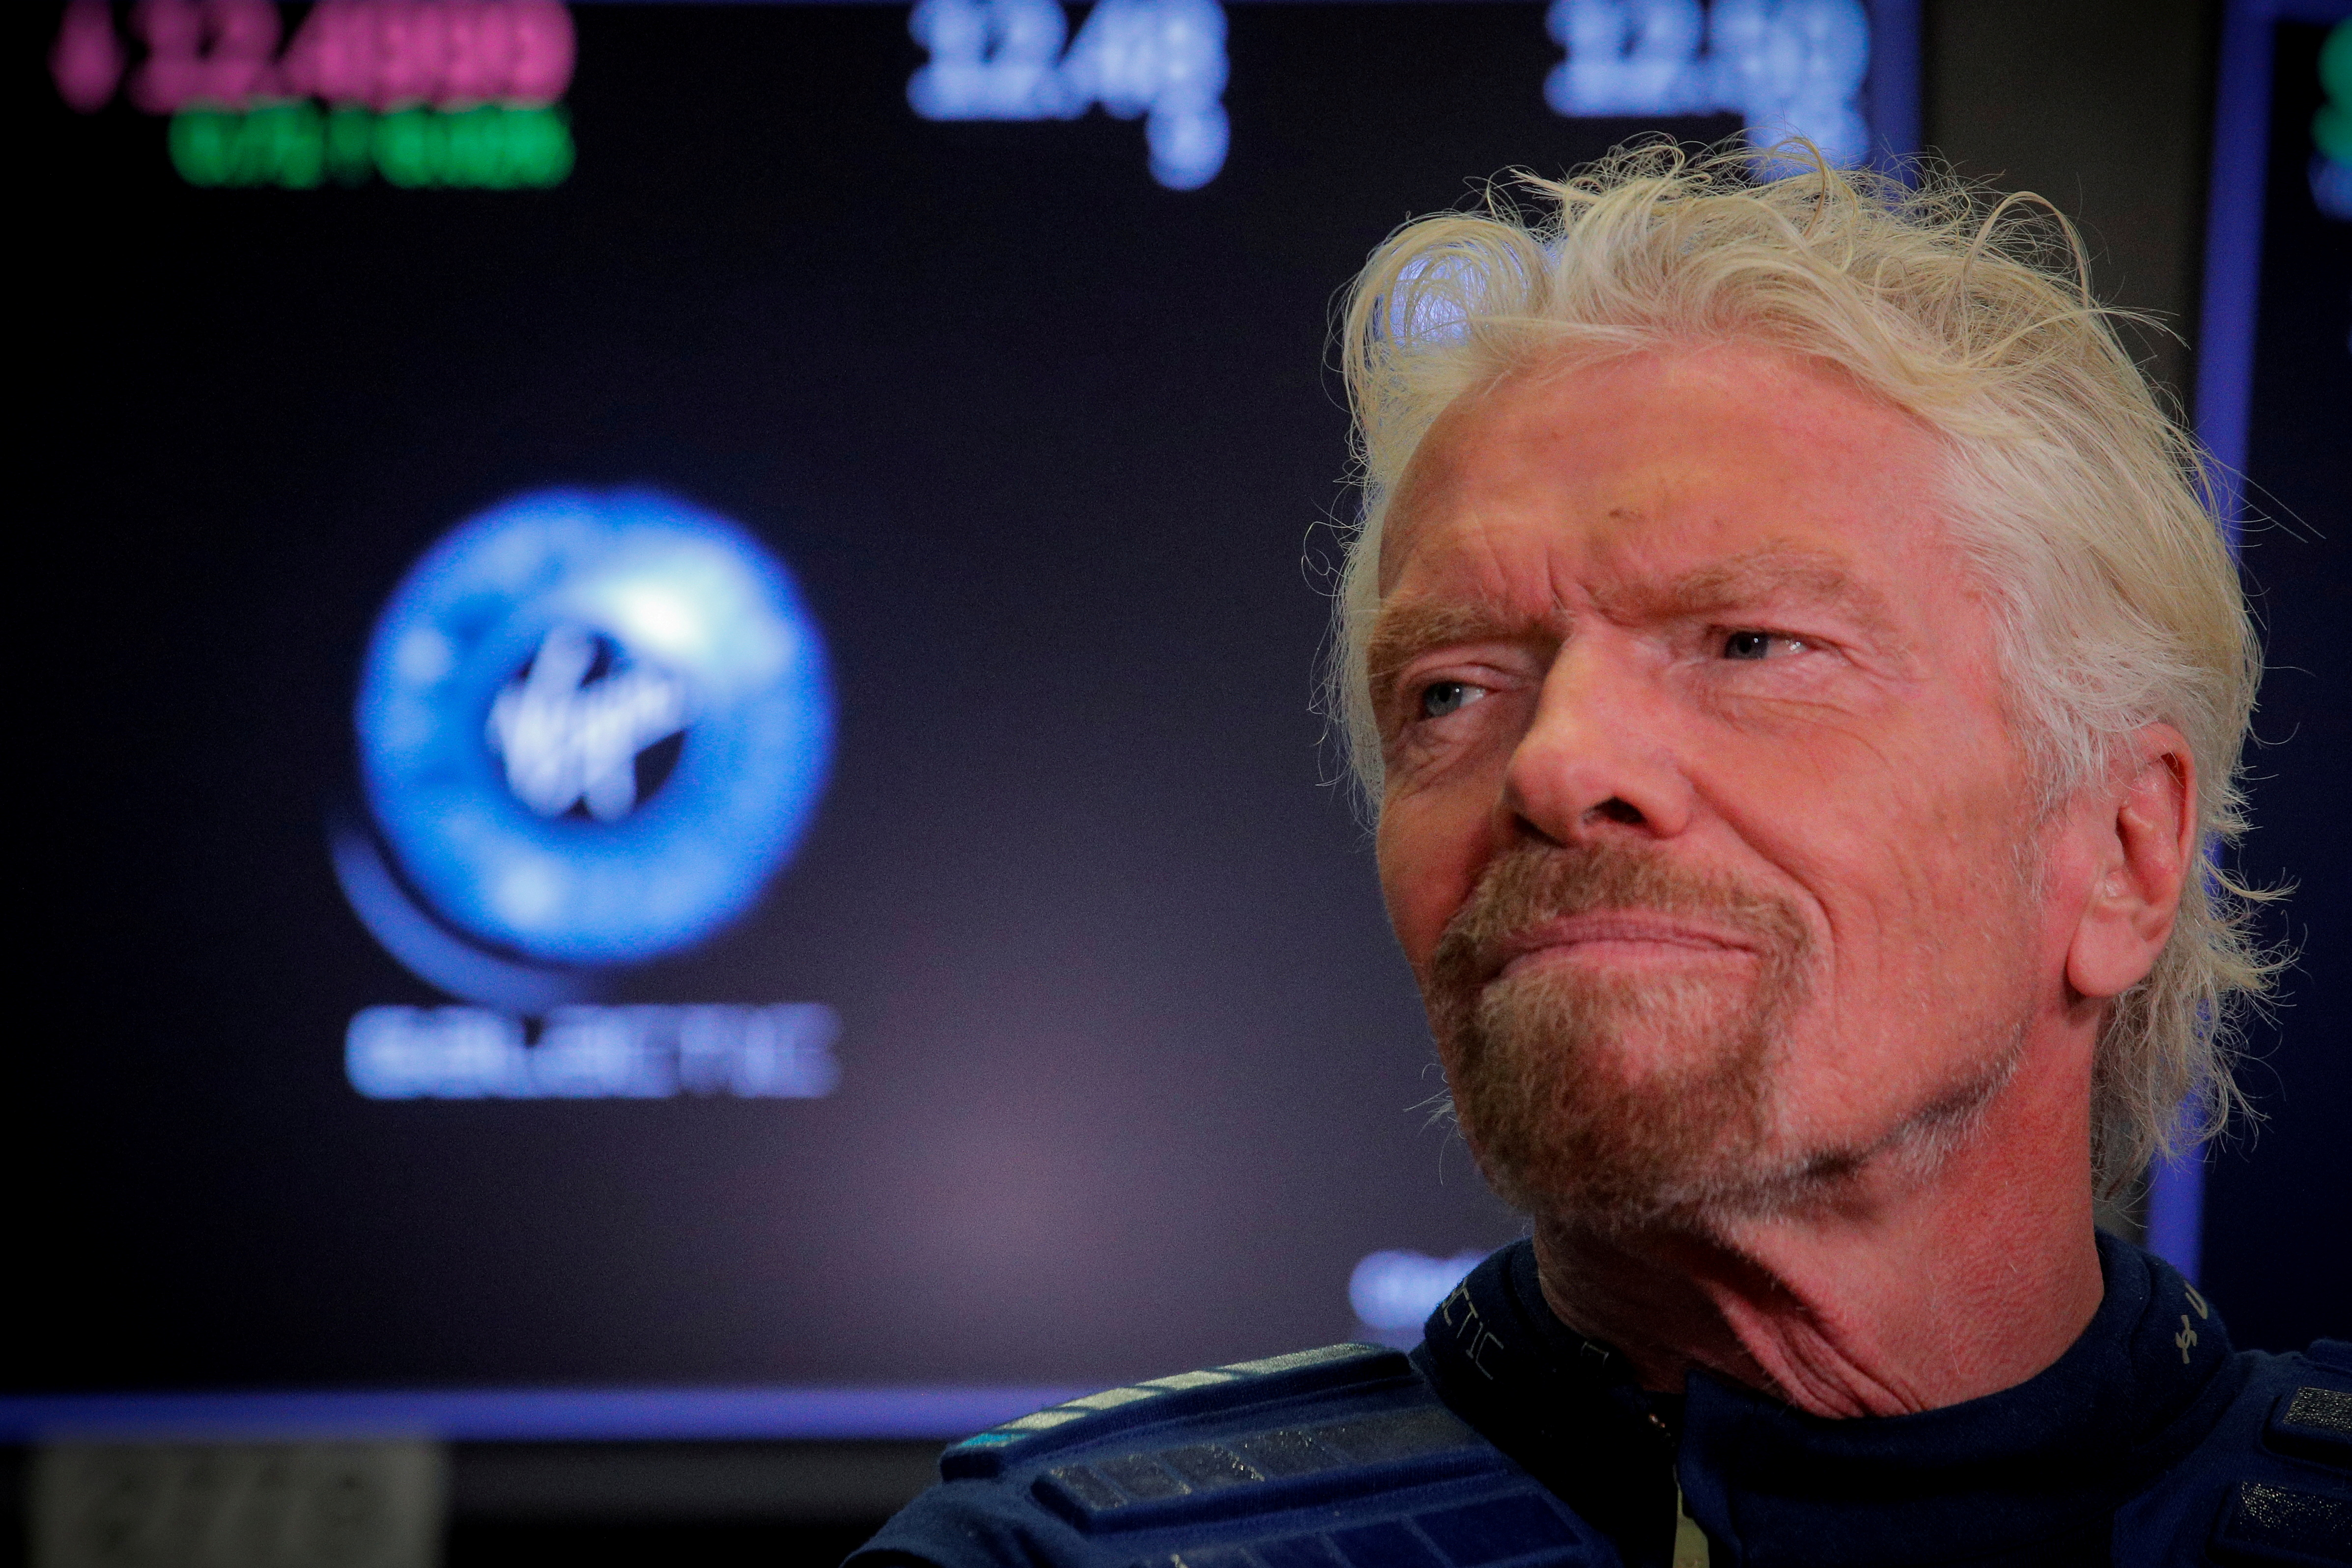 Sir Richard Branson stands on the floor of the New York Stock Exchange (NYSE) ahead of Virgin Galactic (SPCE) trading in New York, U.S., October 28, 2019. REUTERS/Brendan McDermid